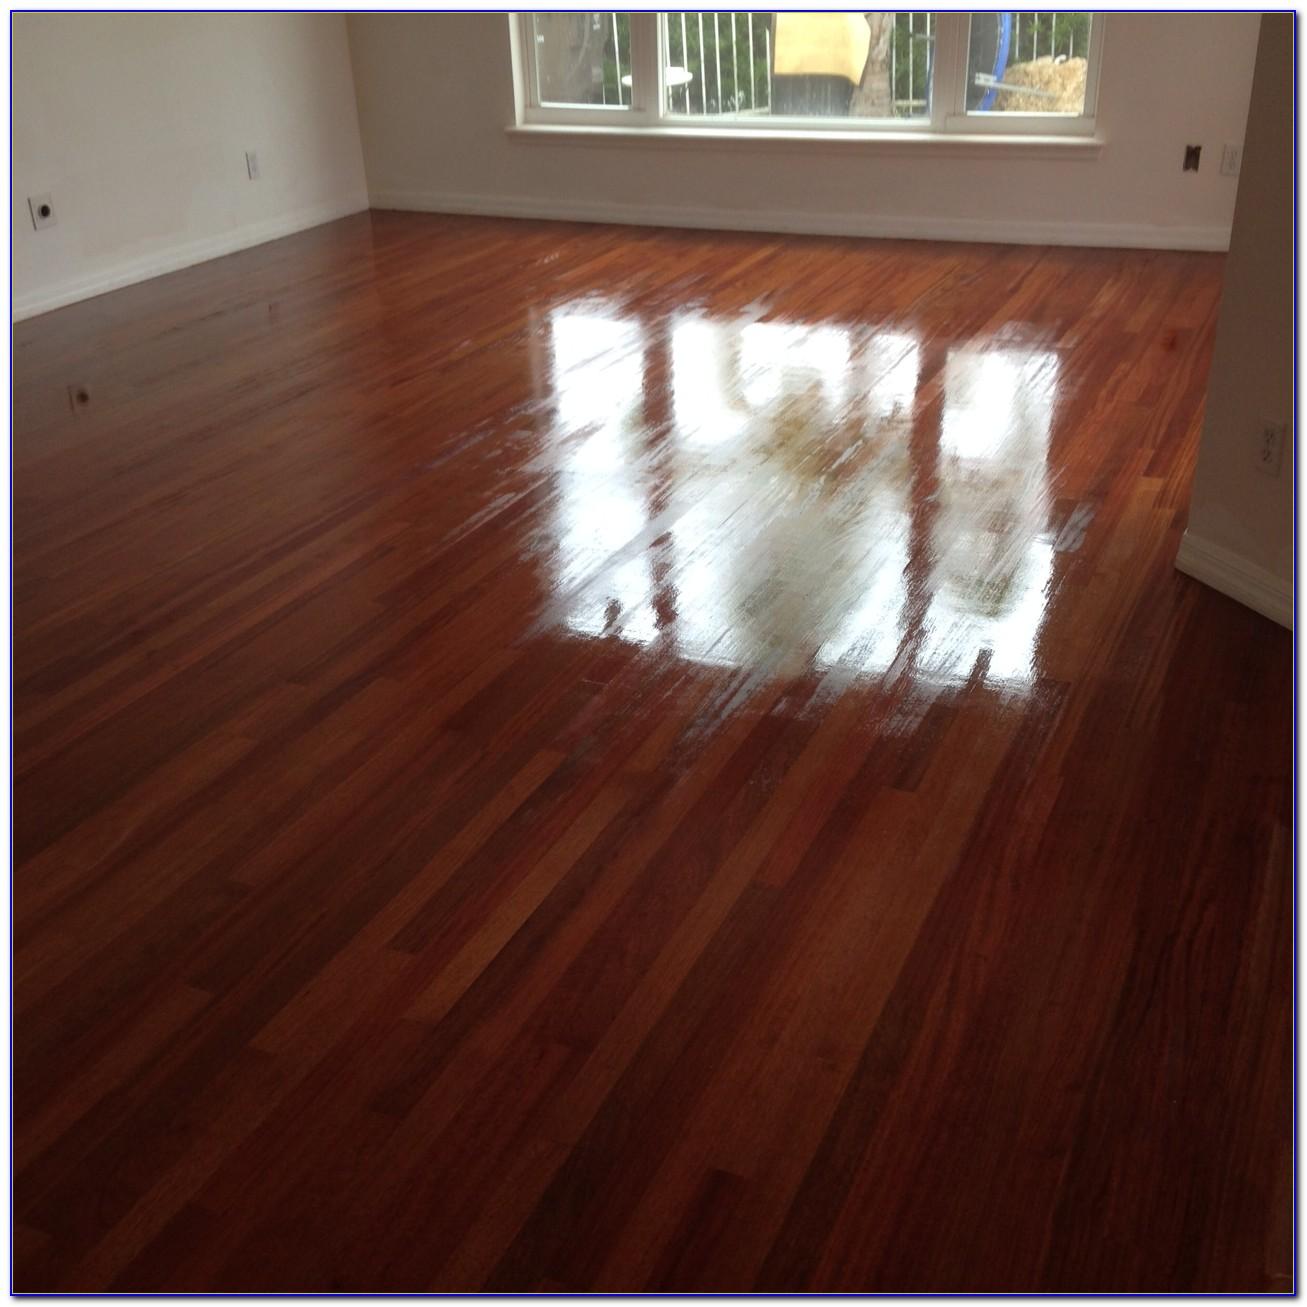 Protective Coating For Hardwood Floors